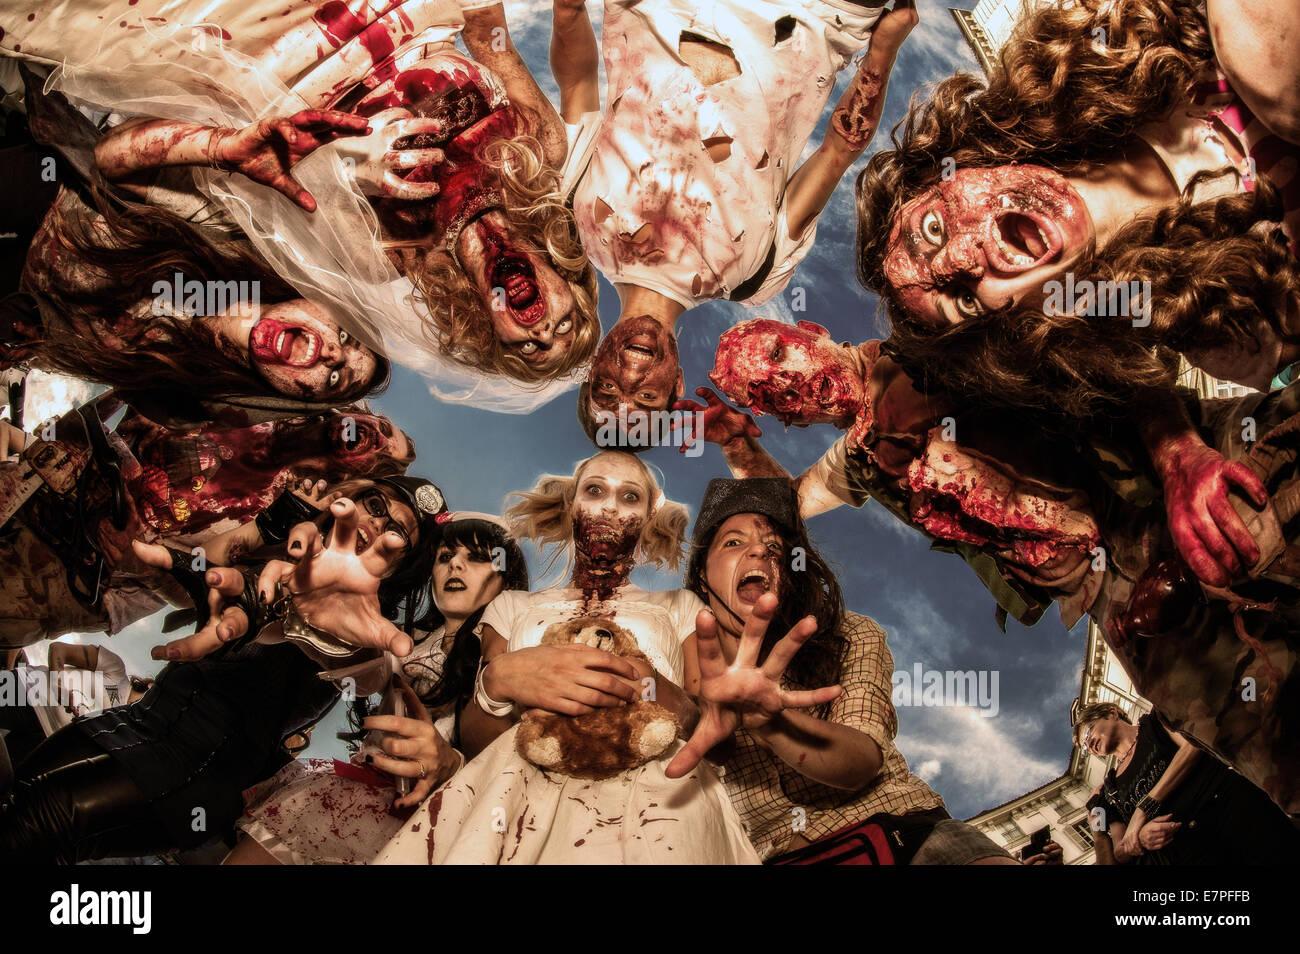 Turín, Italia. 21 Sep, 2014. Zombie Walk en Turín, Italia. Crédito: Realmente fácil Star/Alamy Imagen De Stock